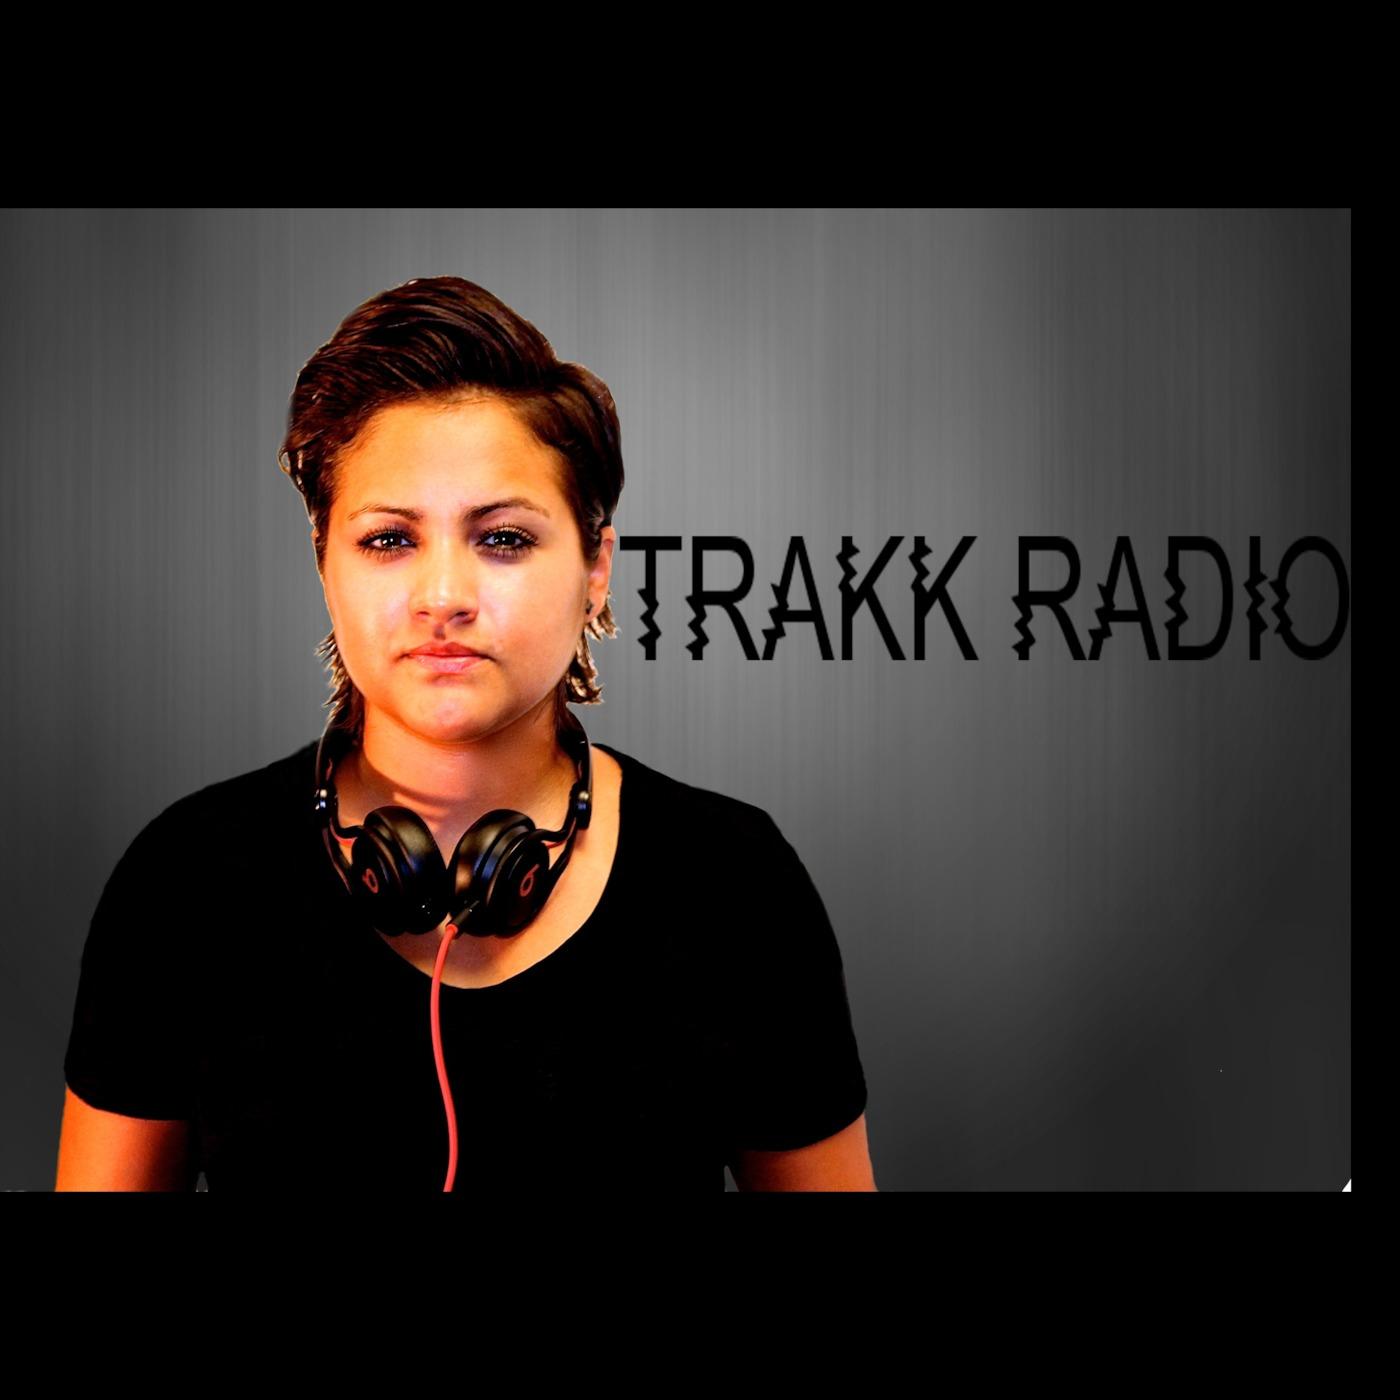 TRAKK RADIO